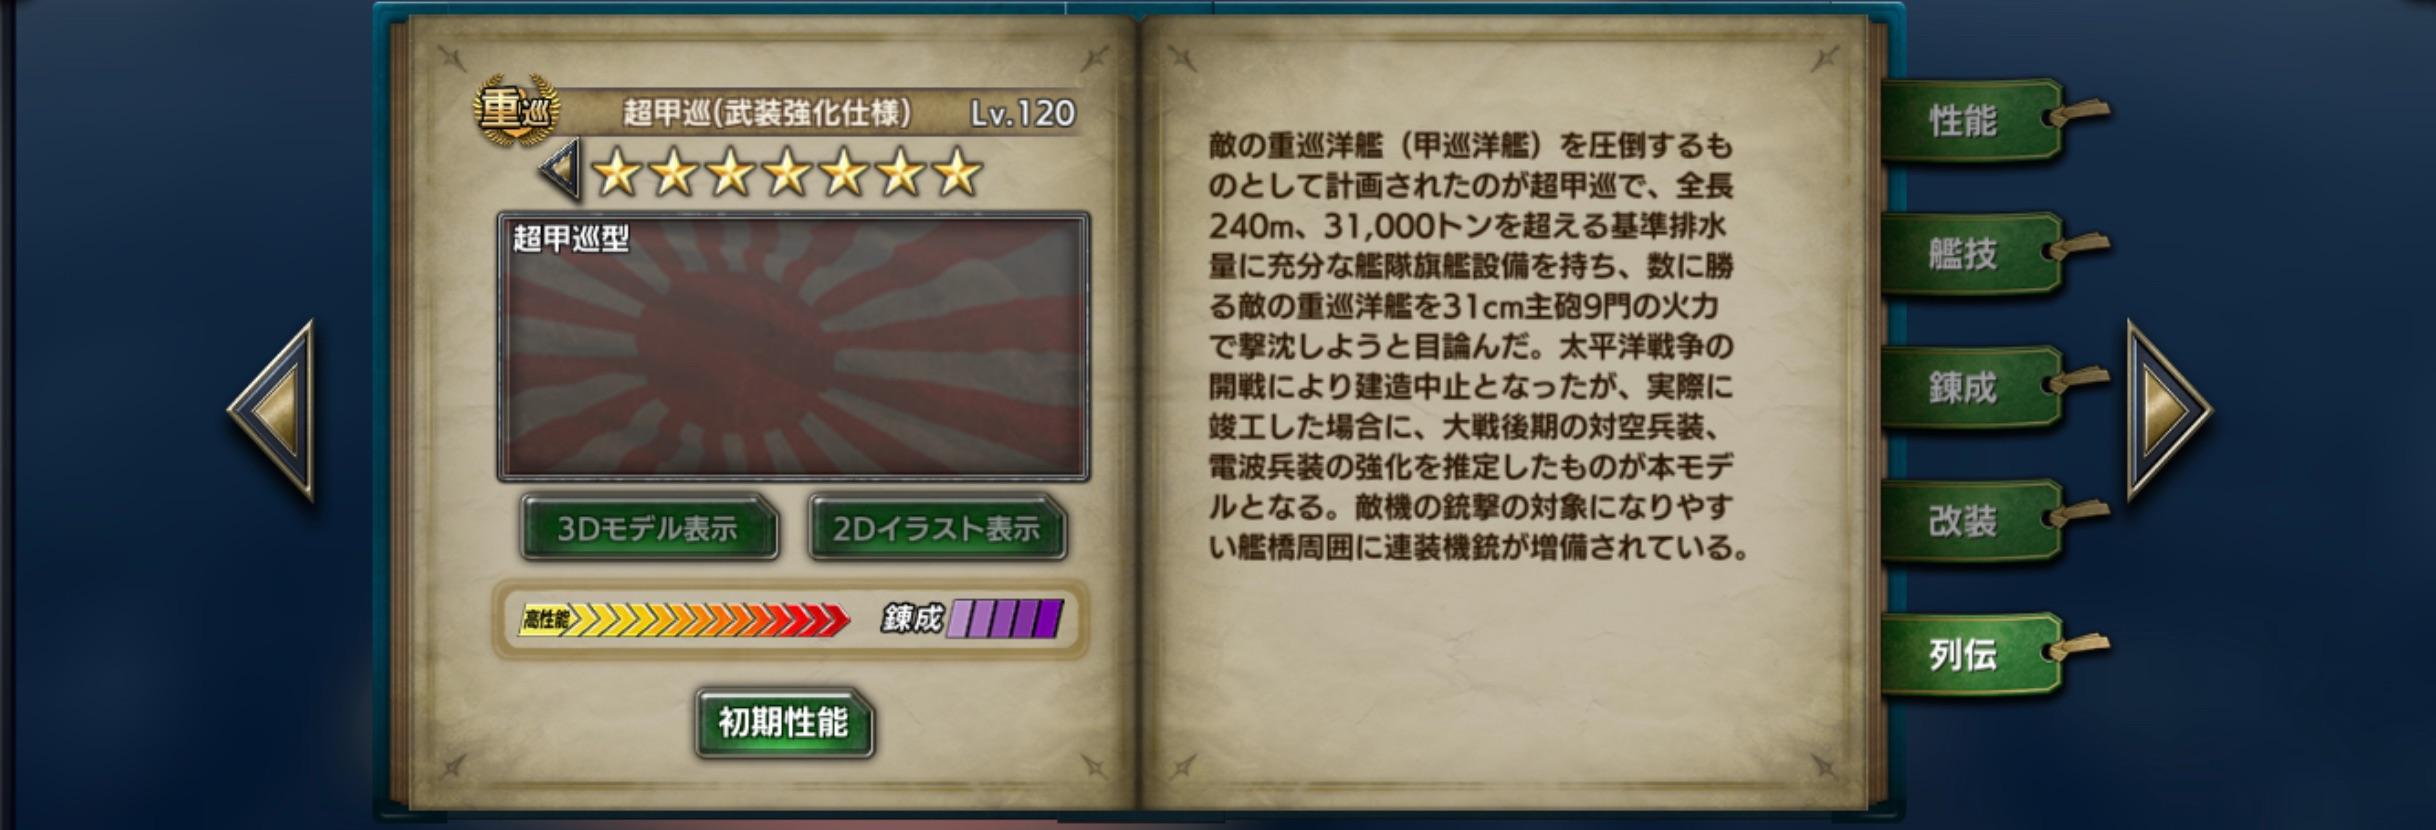 ChoukoujyunA-history